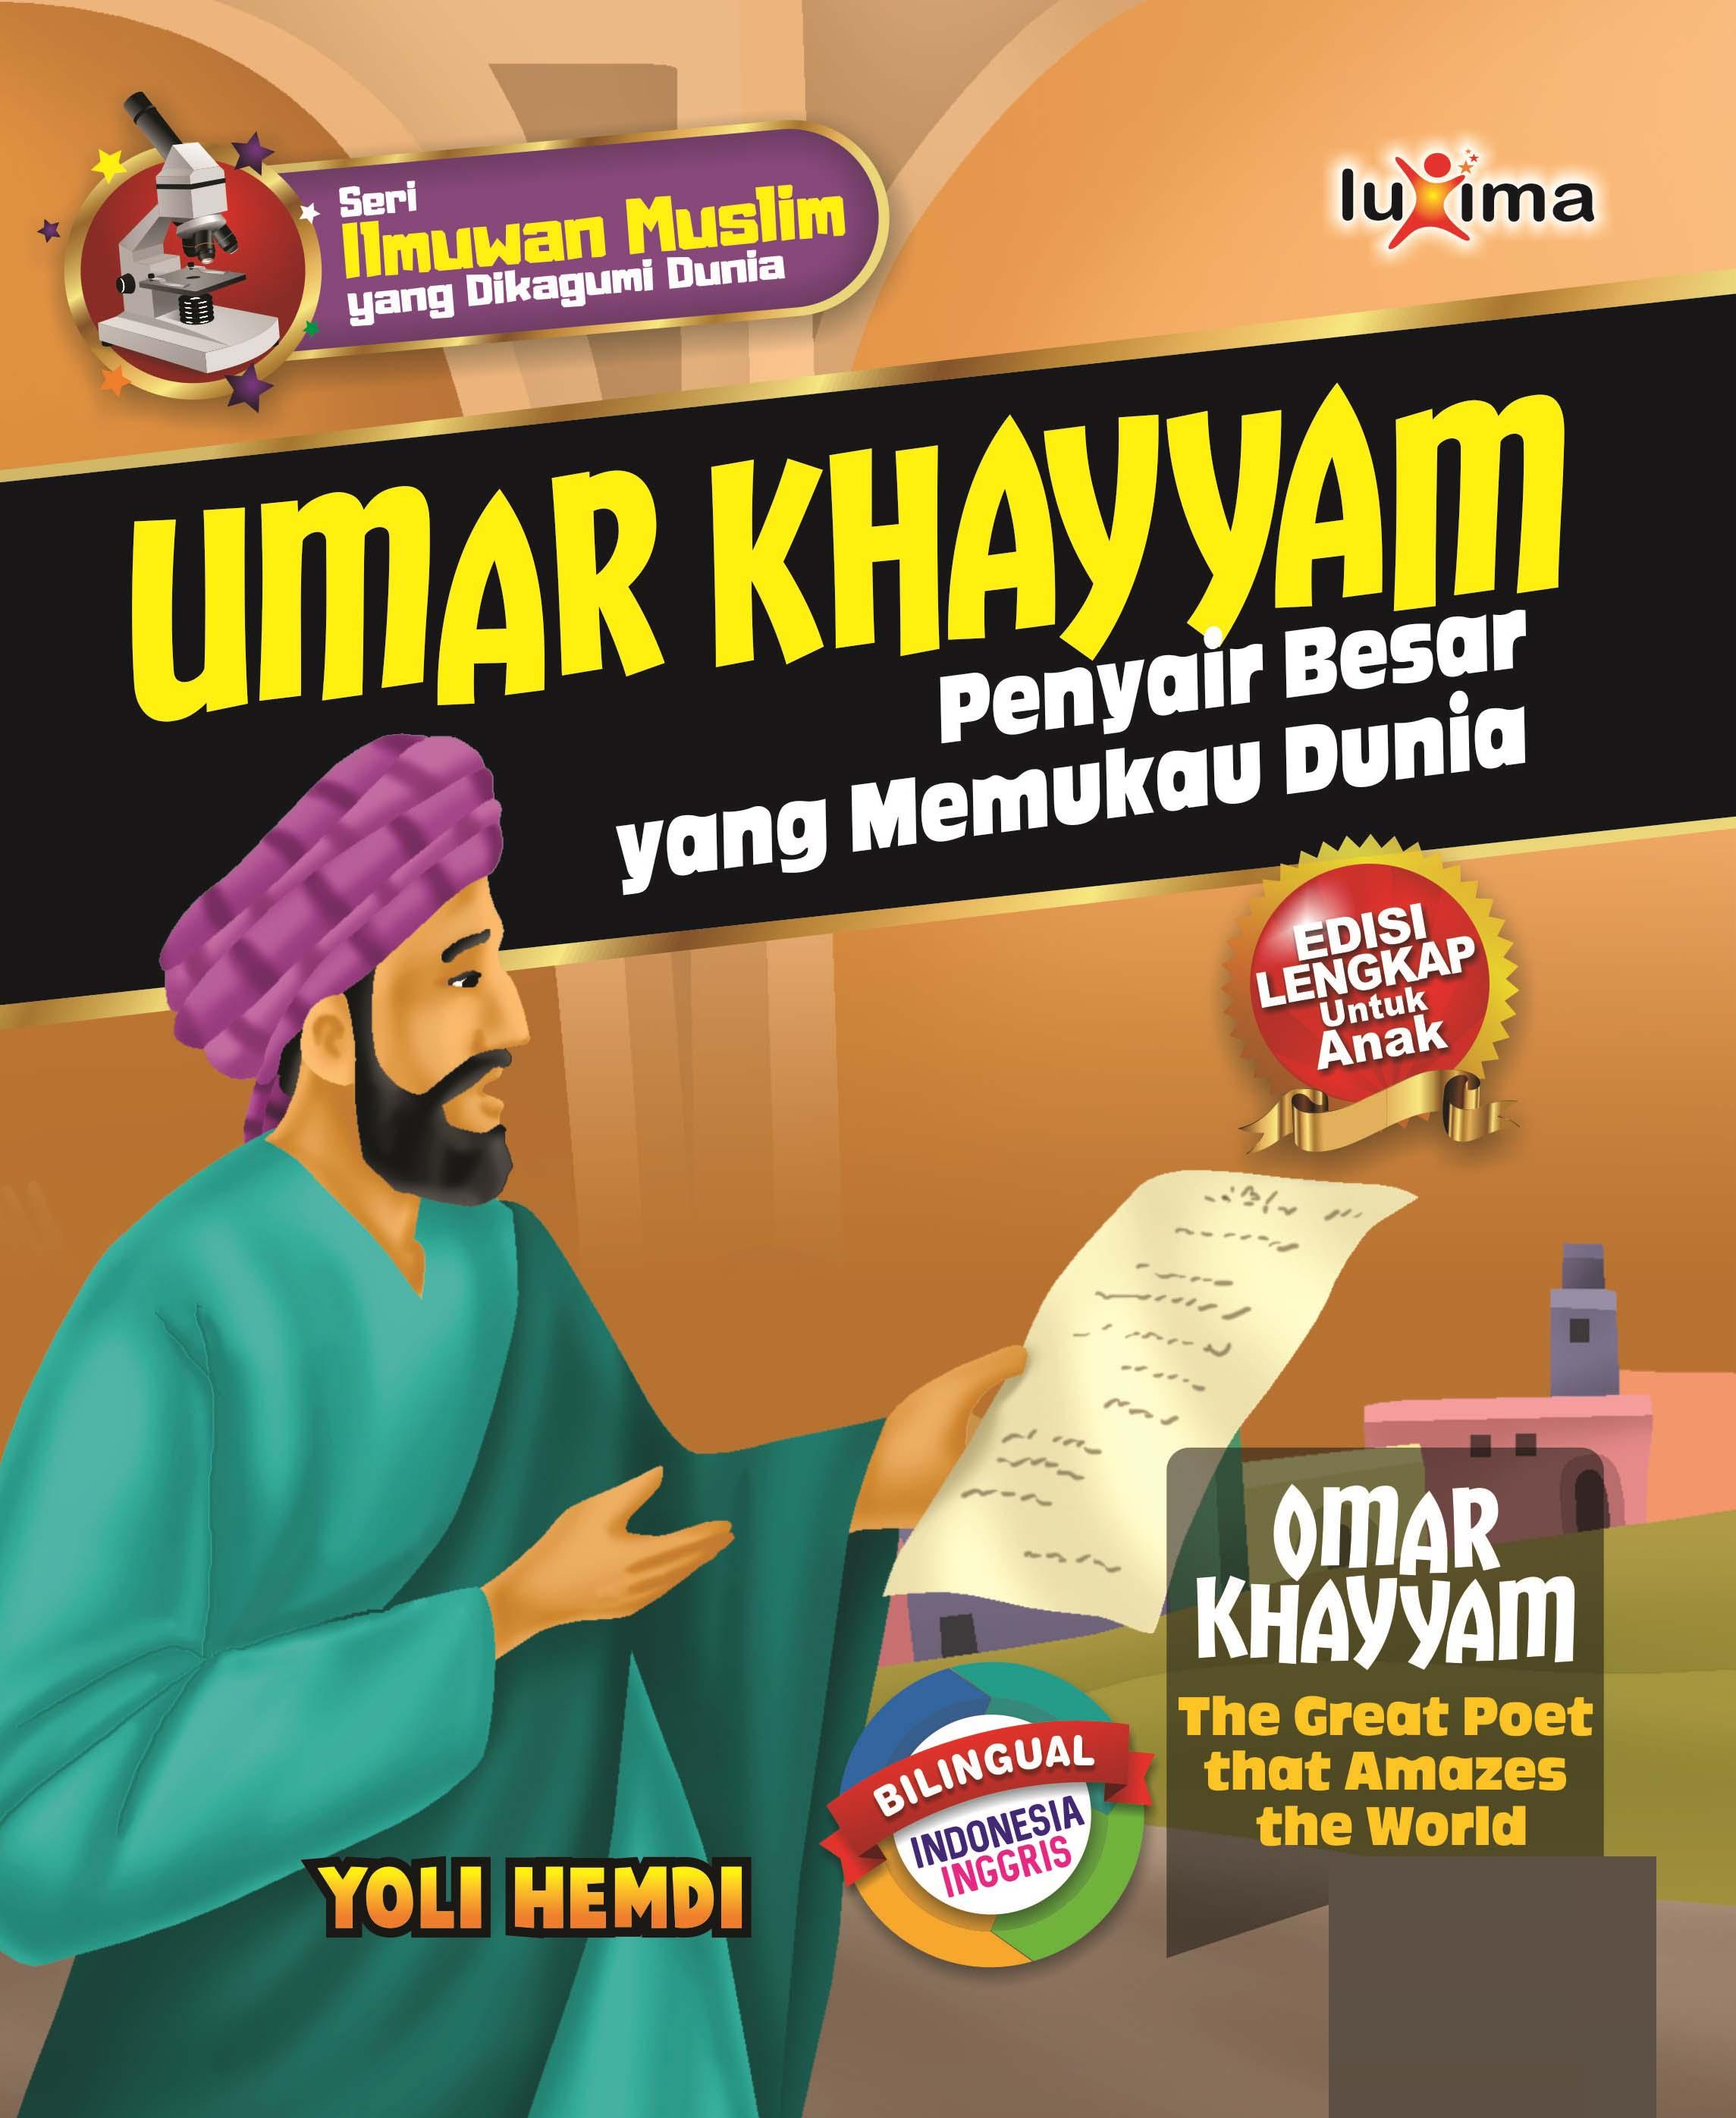 Umar Khayyam [sumber elektronis] : penyair yang memukau dunia = Umar Khayyam : the great poet that amazes the world